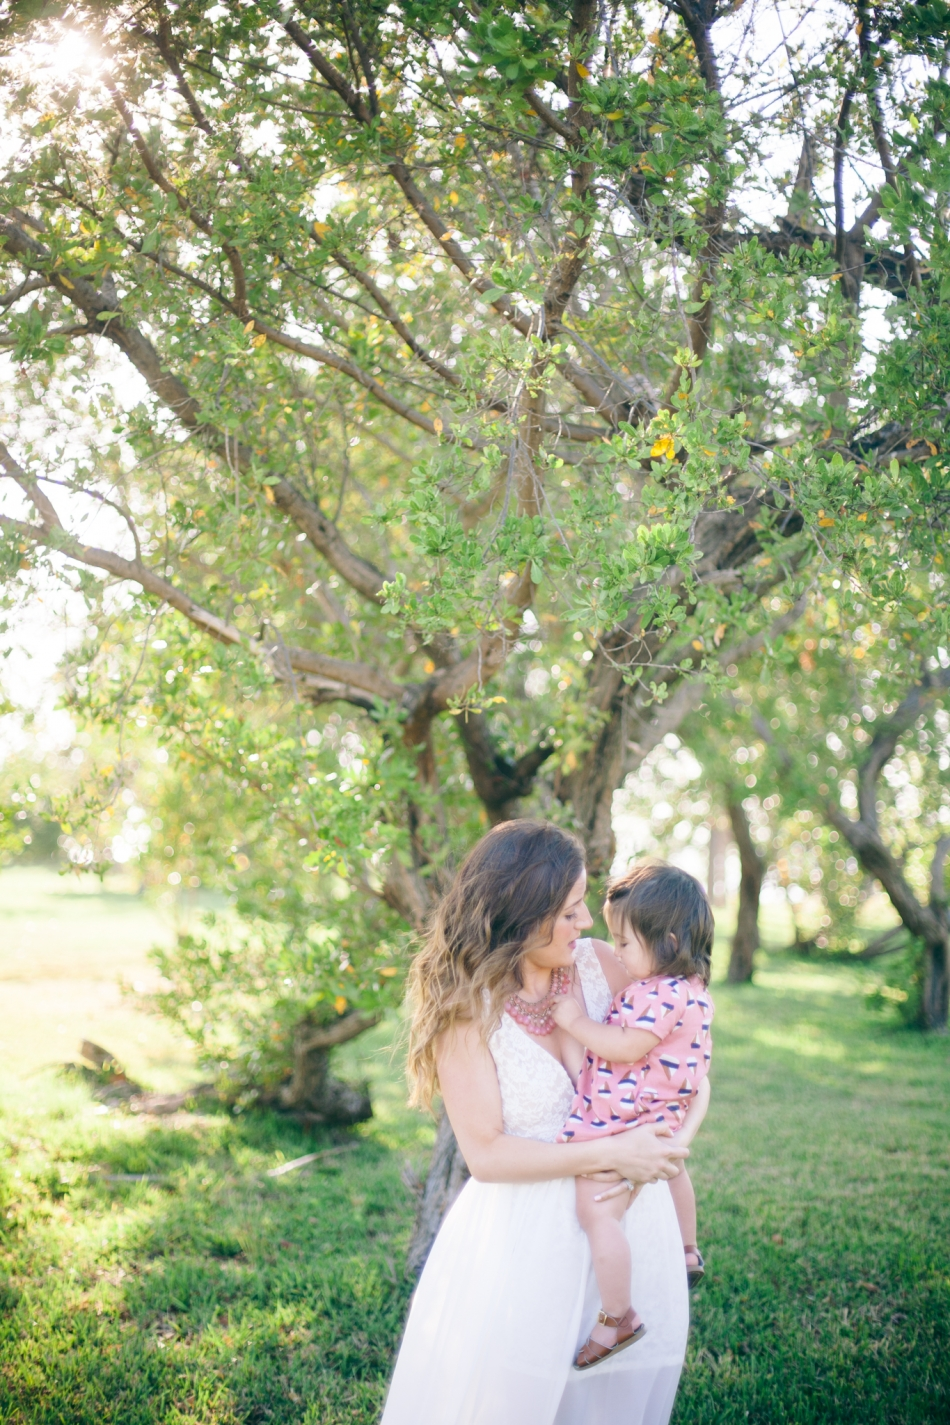 outdoor natural light family photos in south florida